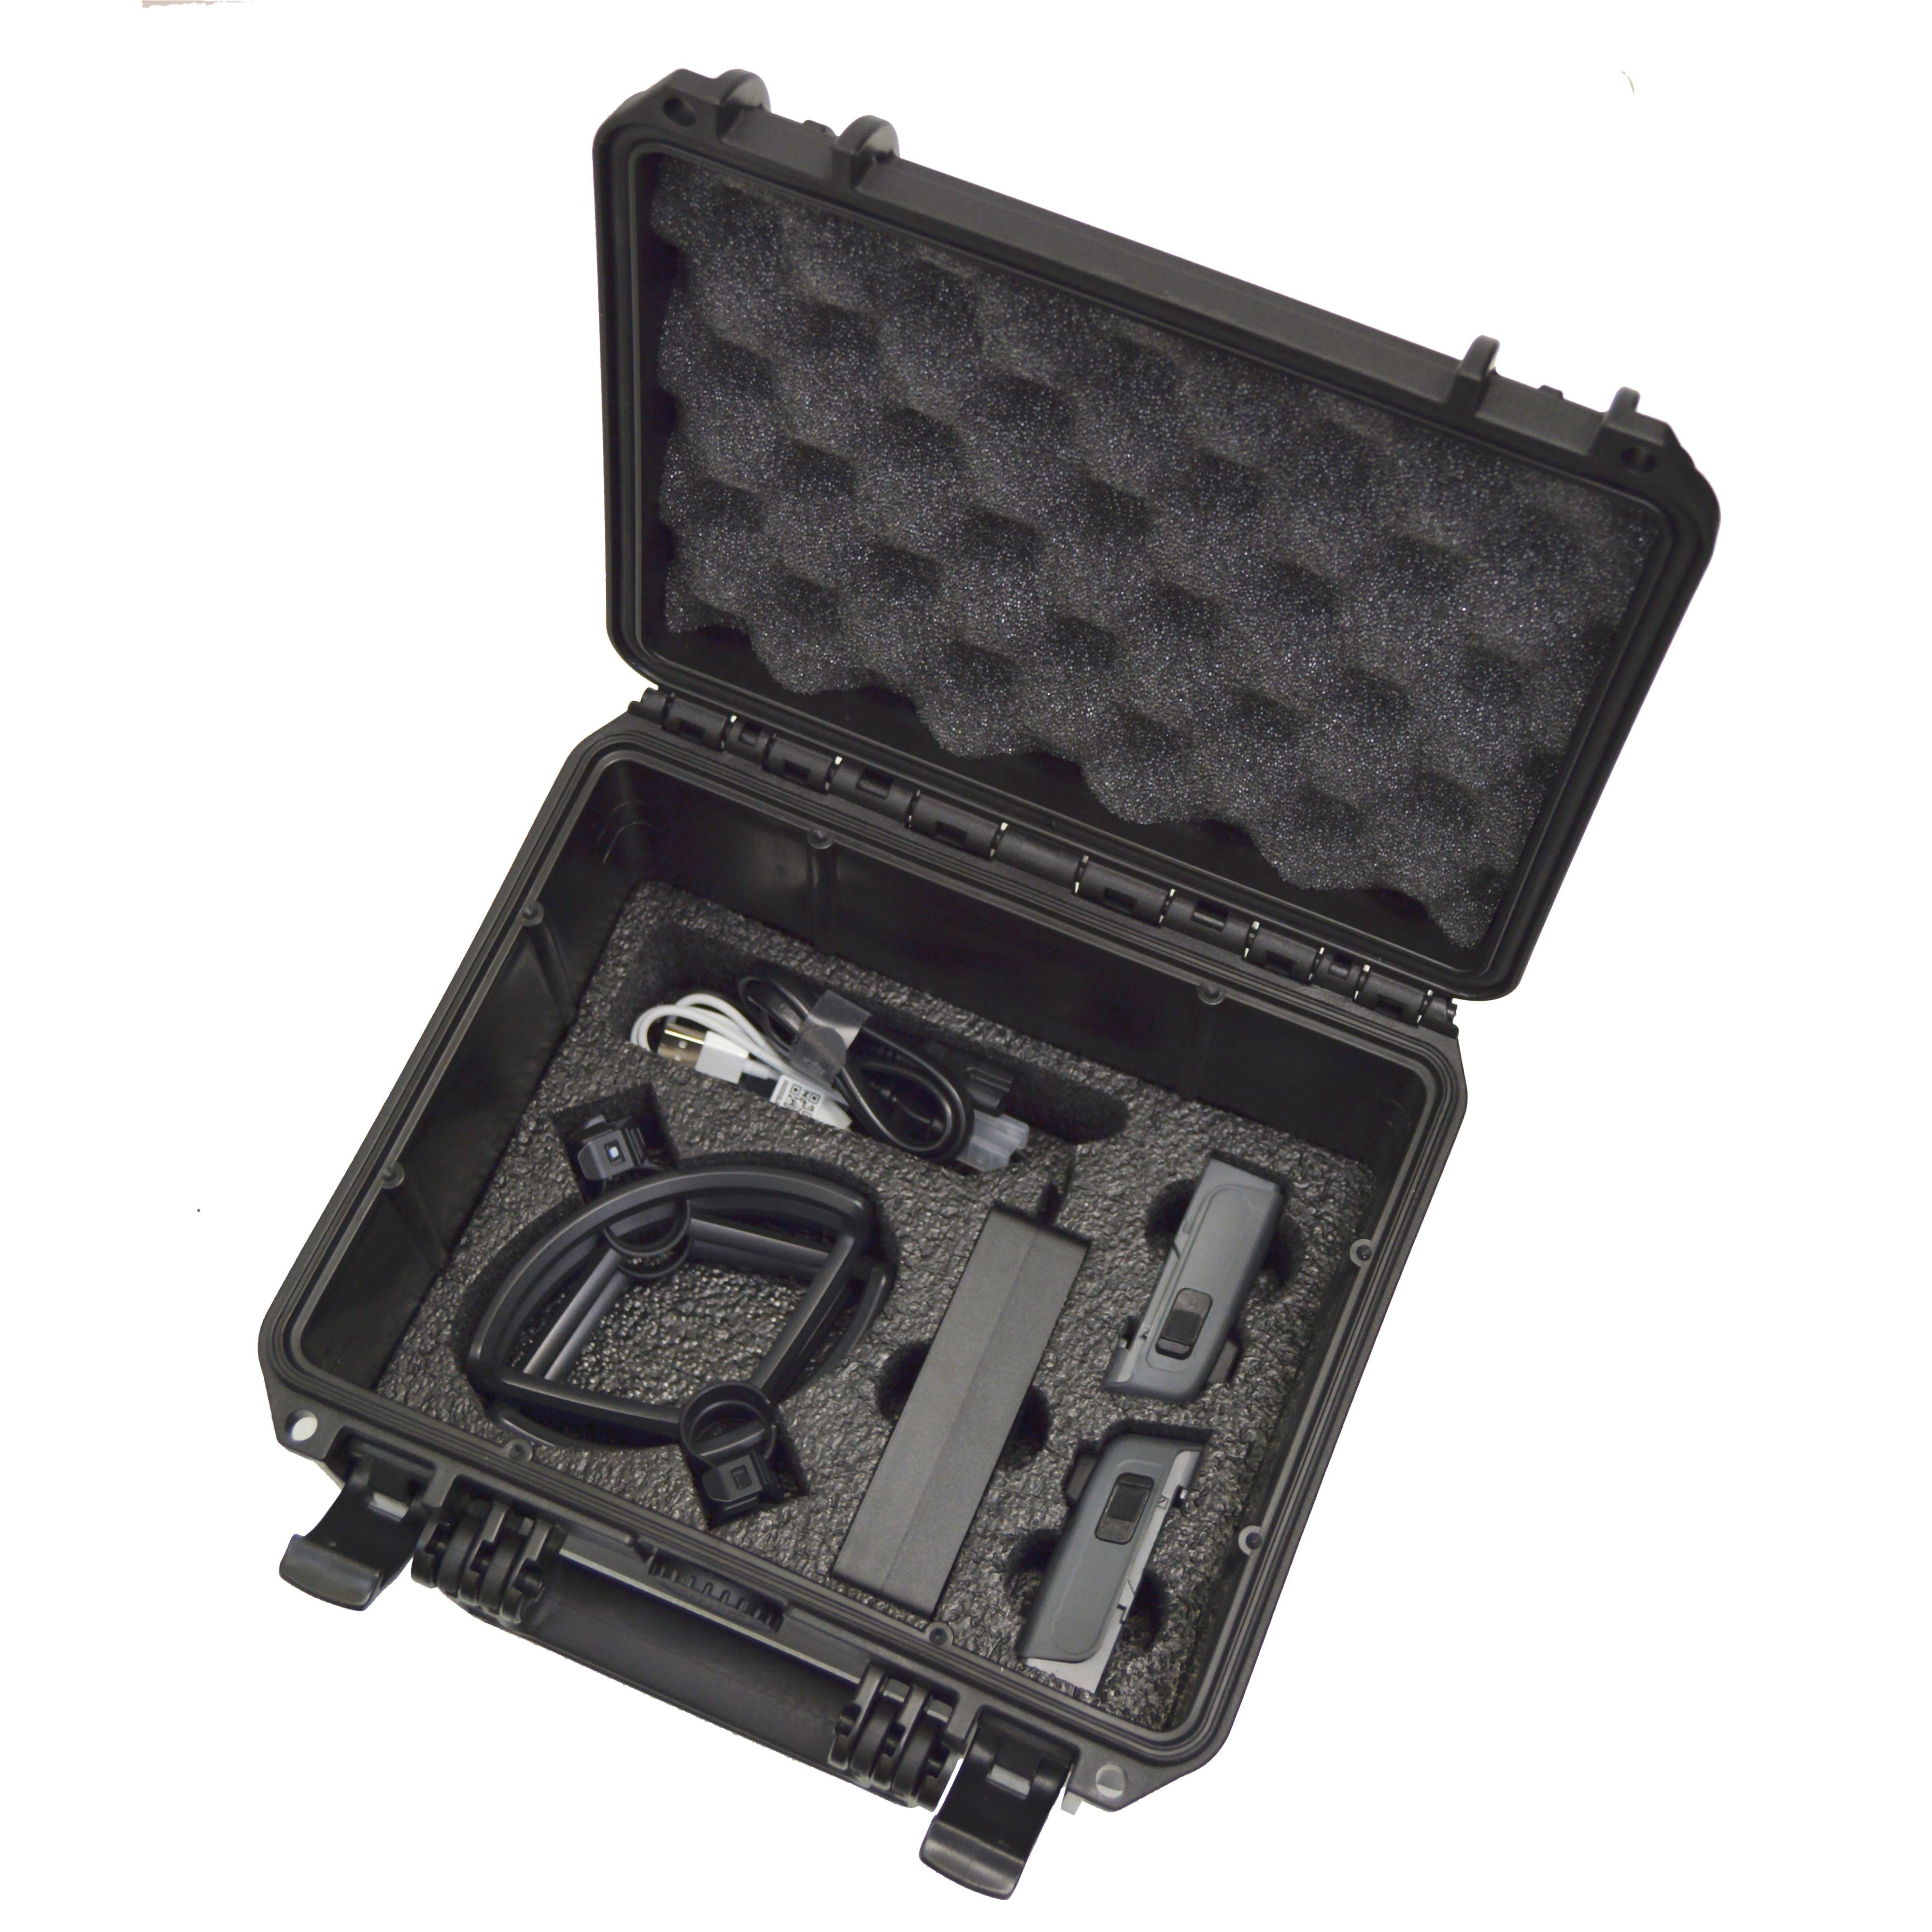 DJI Spark dual-level custom foam DORO D0907-6 case - BOTTOM LEVEL